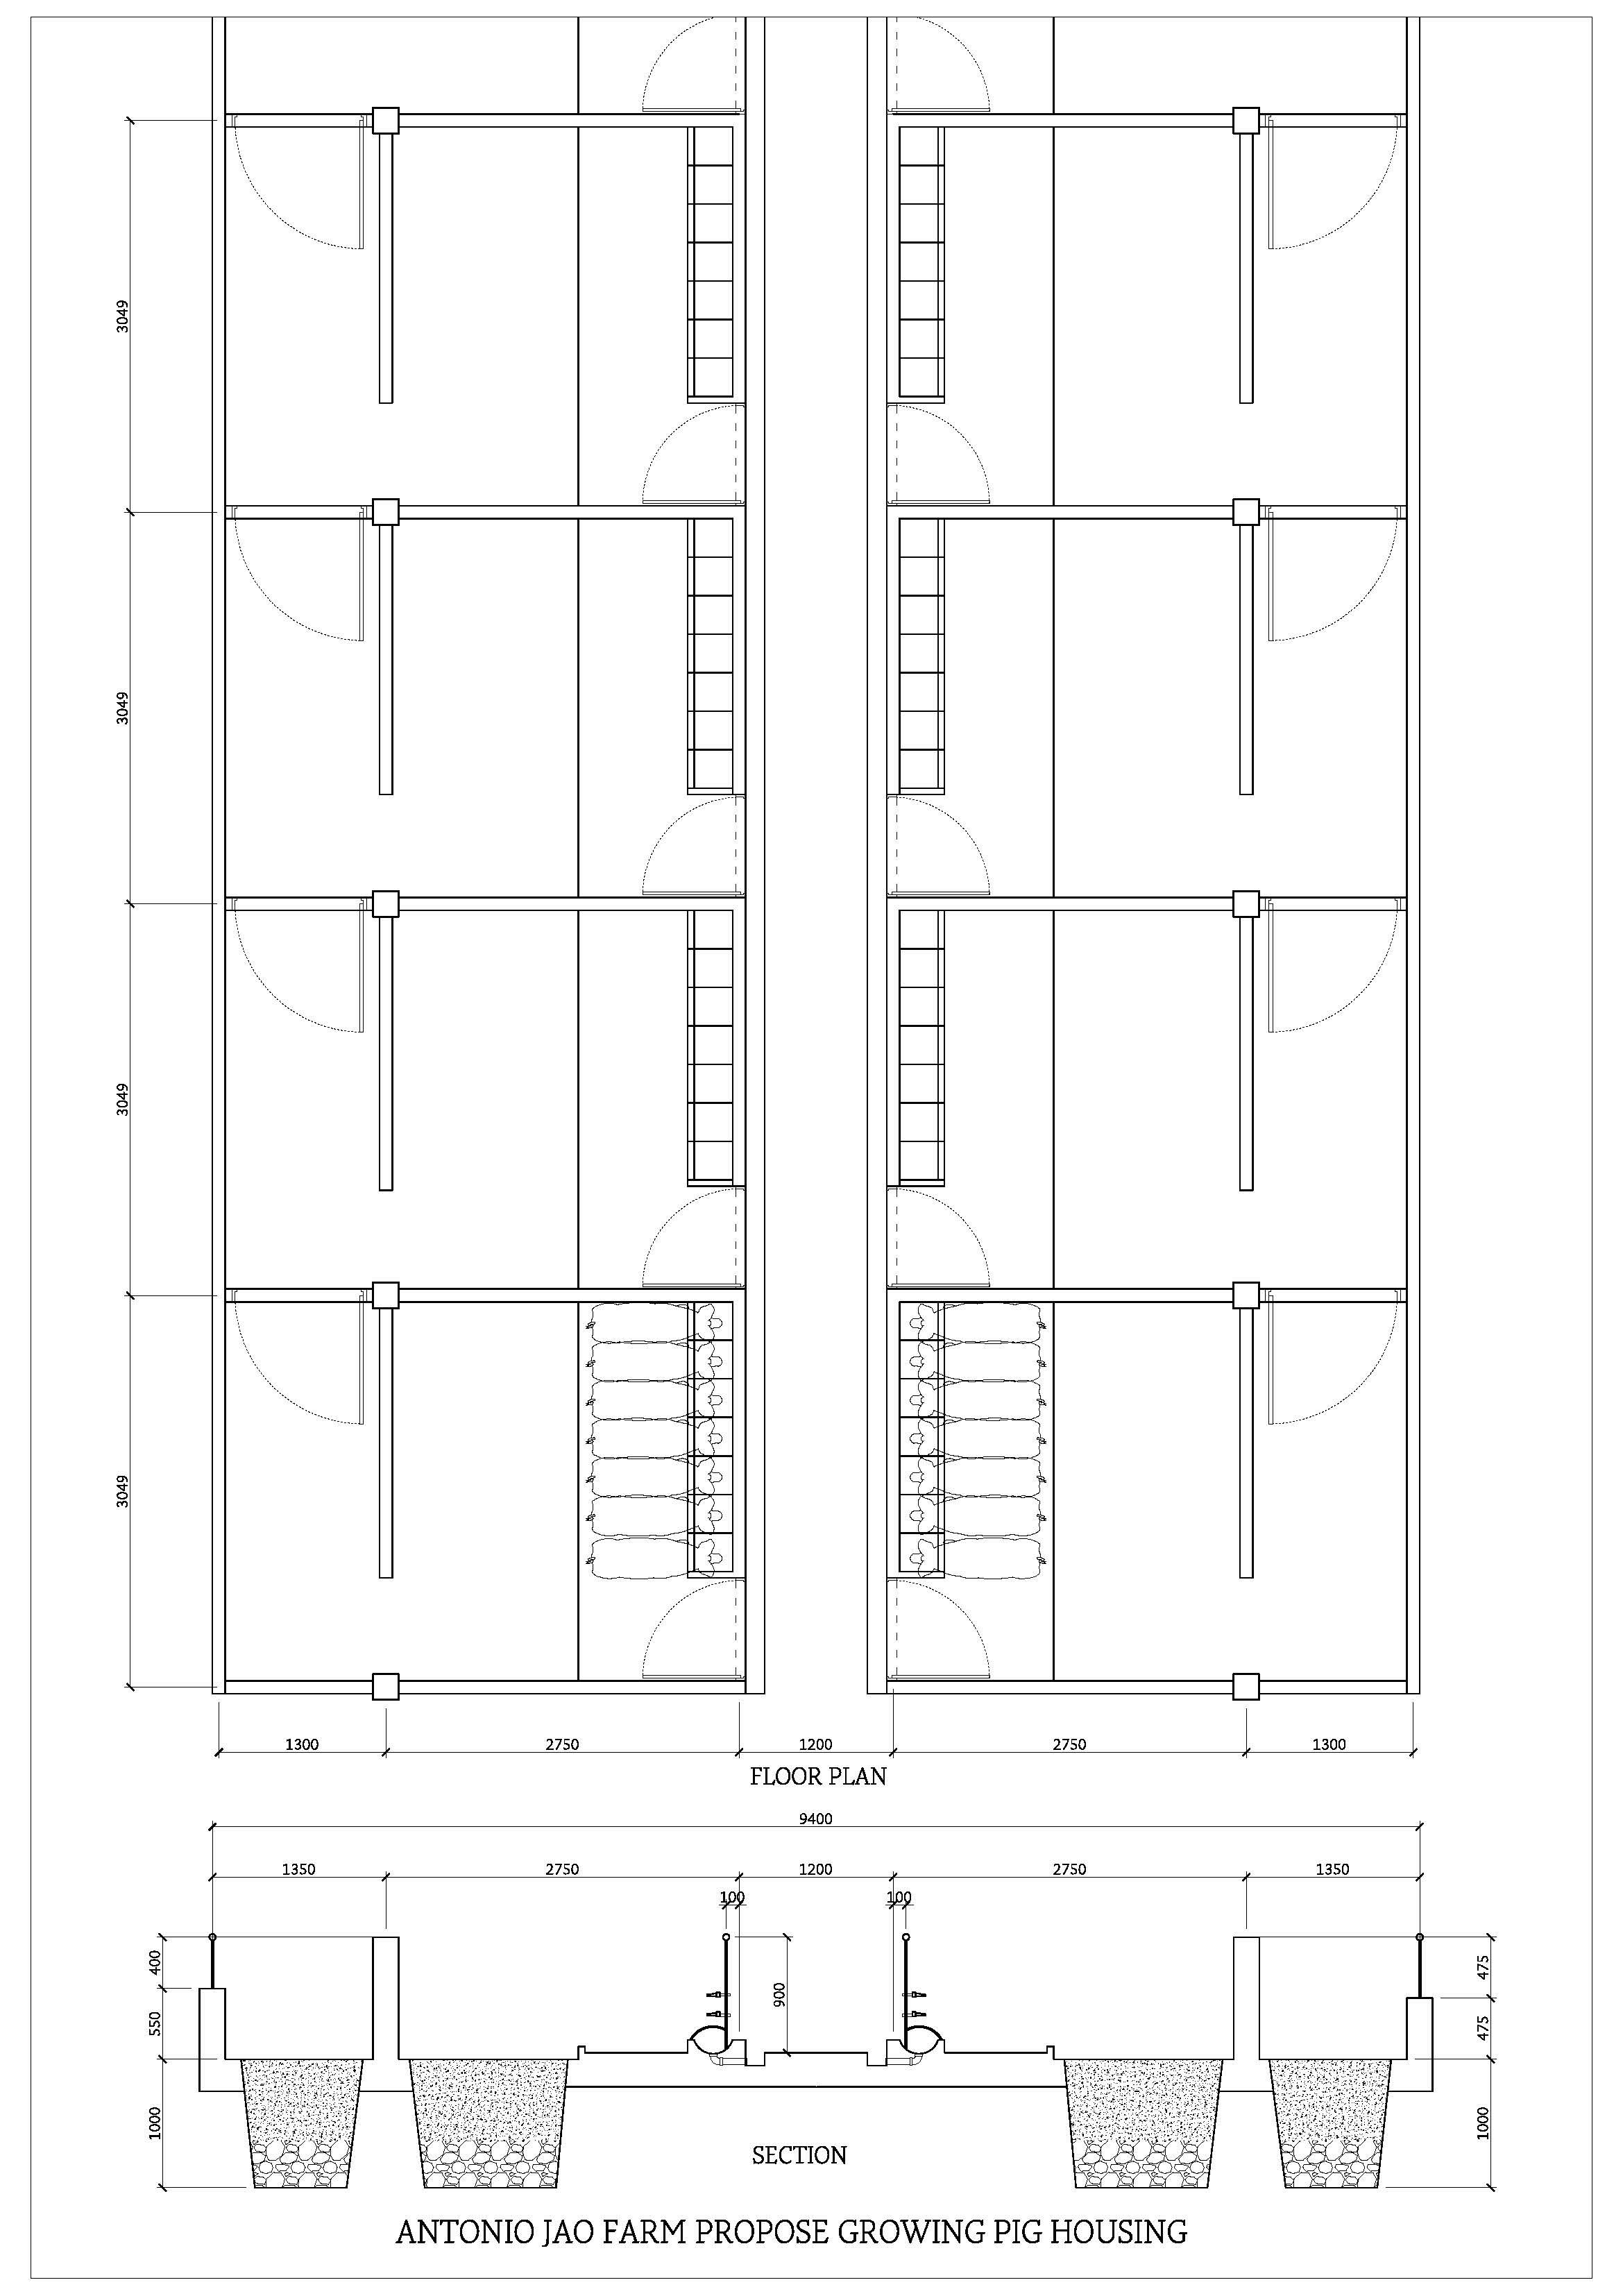 Pin On Diseno De Granja Backyard piggery house design